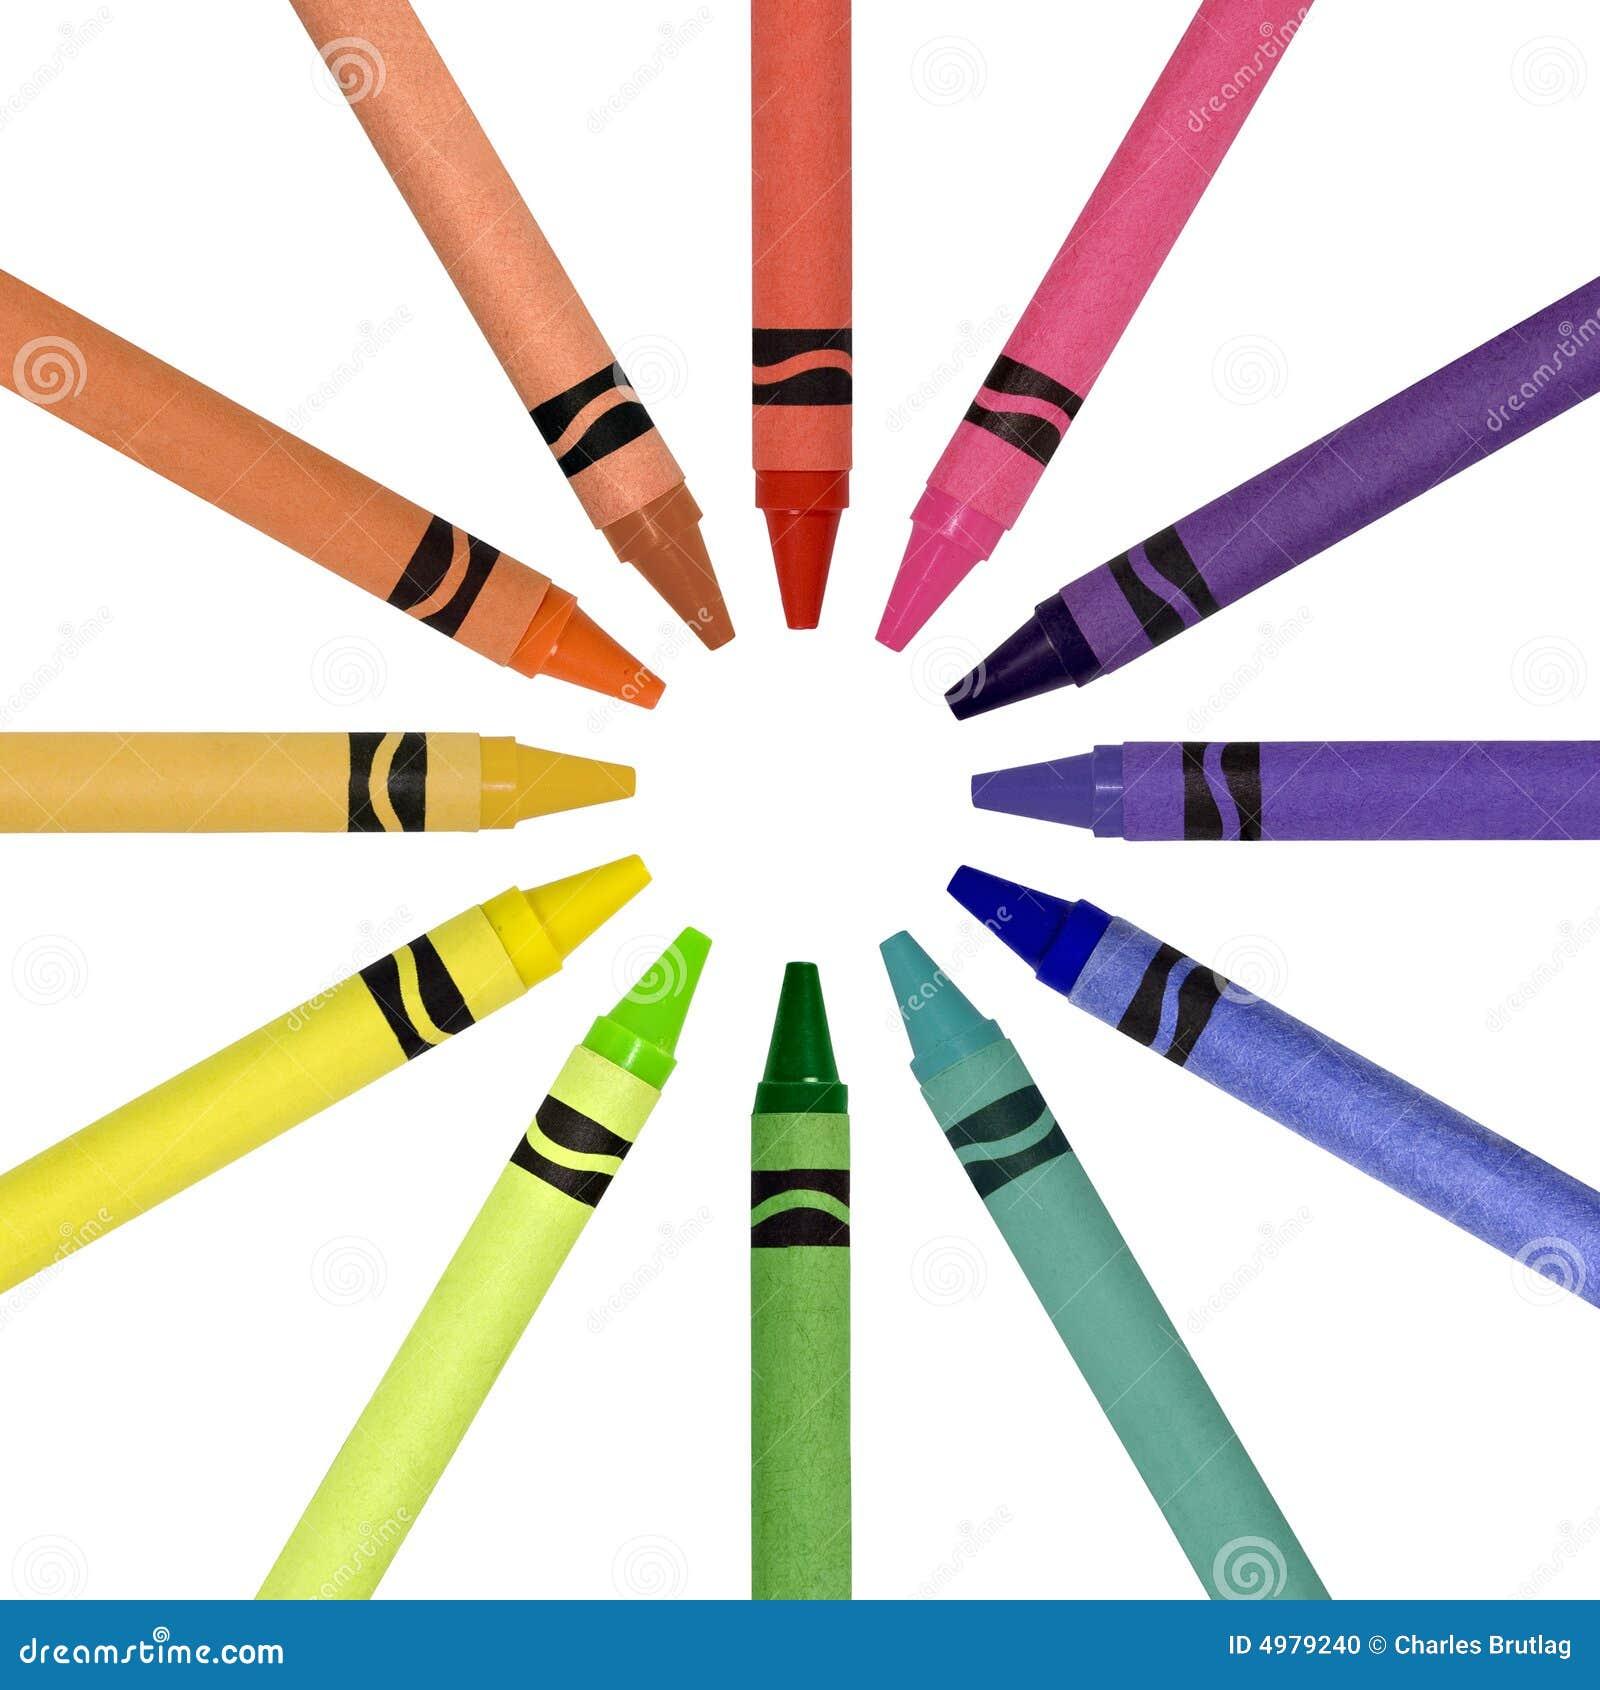 Crayon Colored Circle : Crayons in a circle stock photo image of supplies